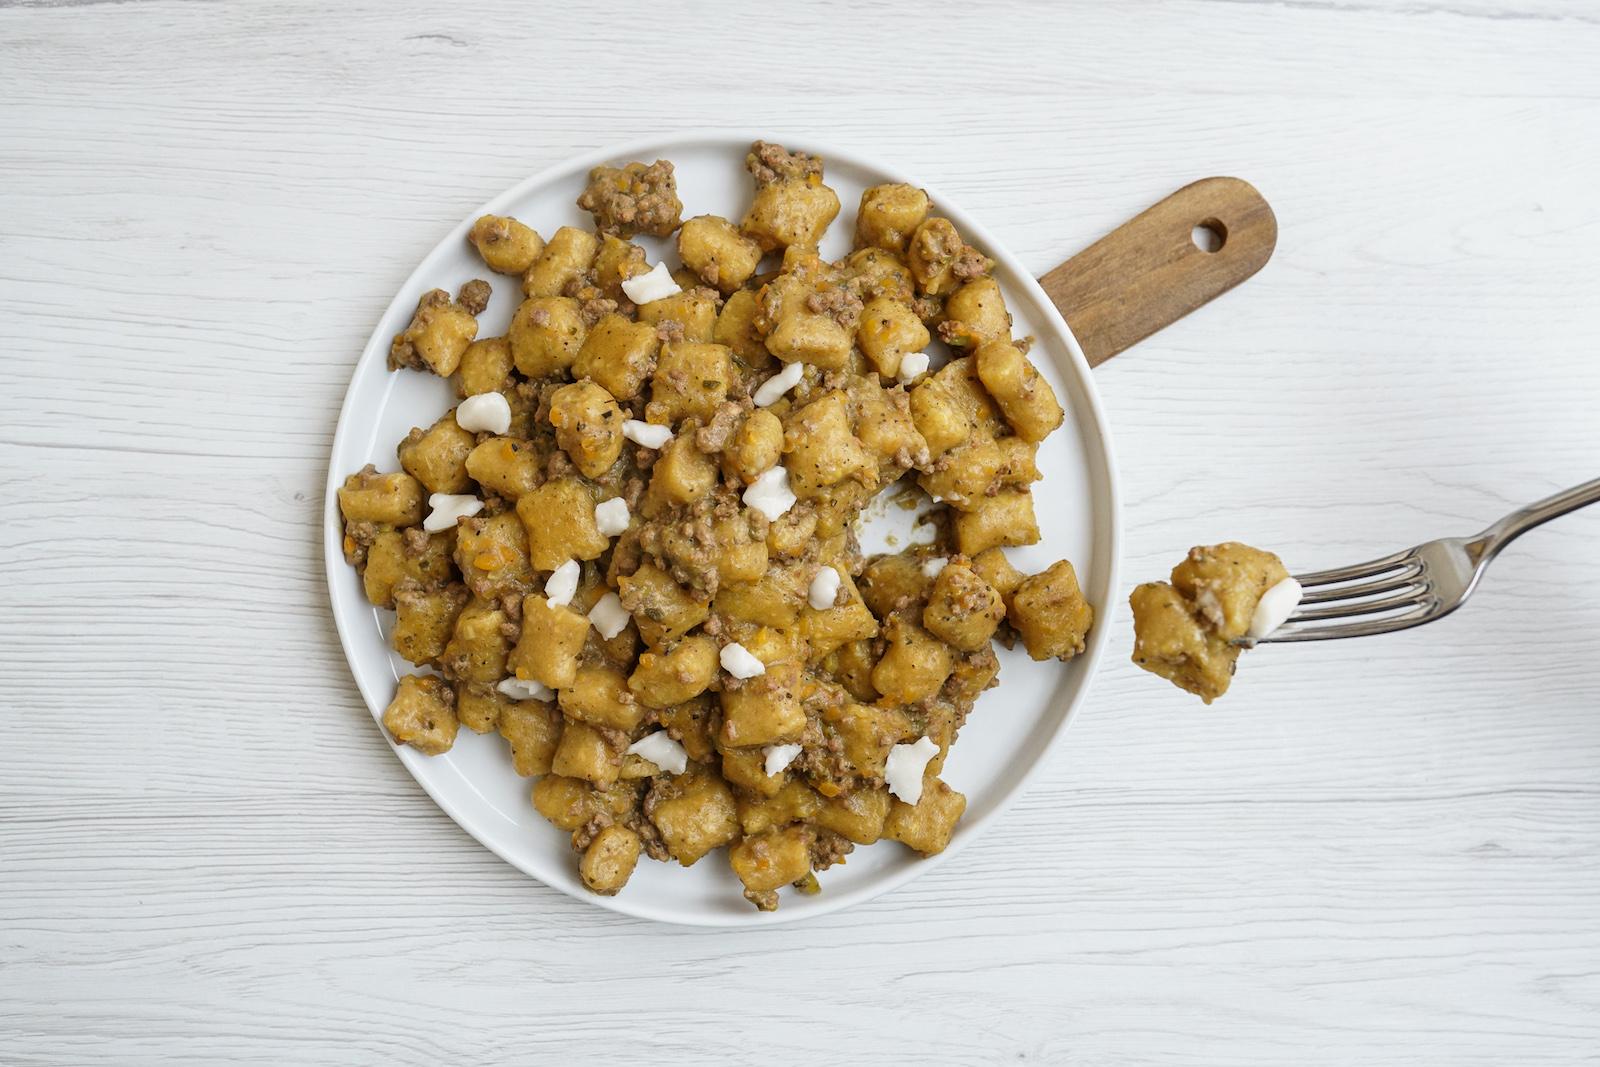 AIP Italian Gnocchi - AIP Italian Food Recipes from the AIP Italian Cookbook